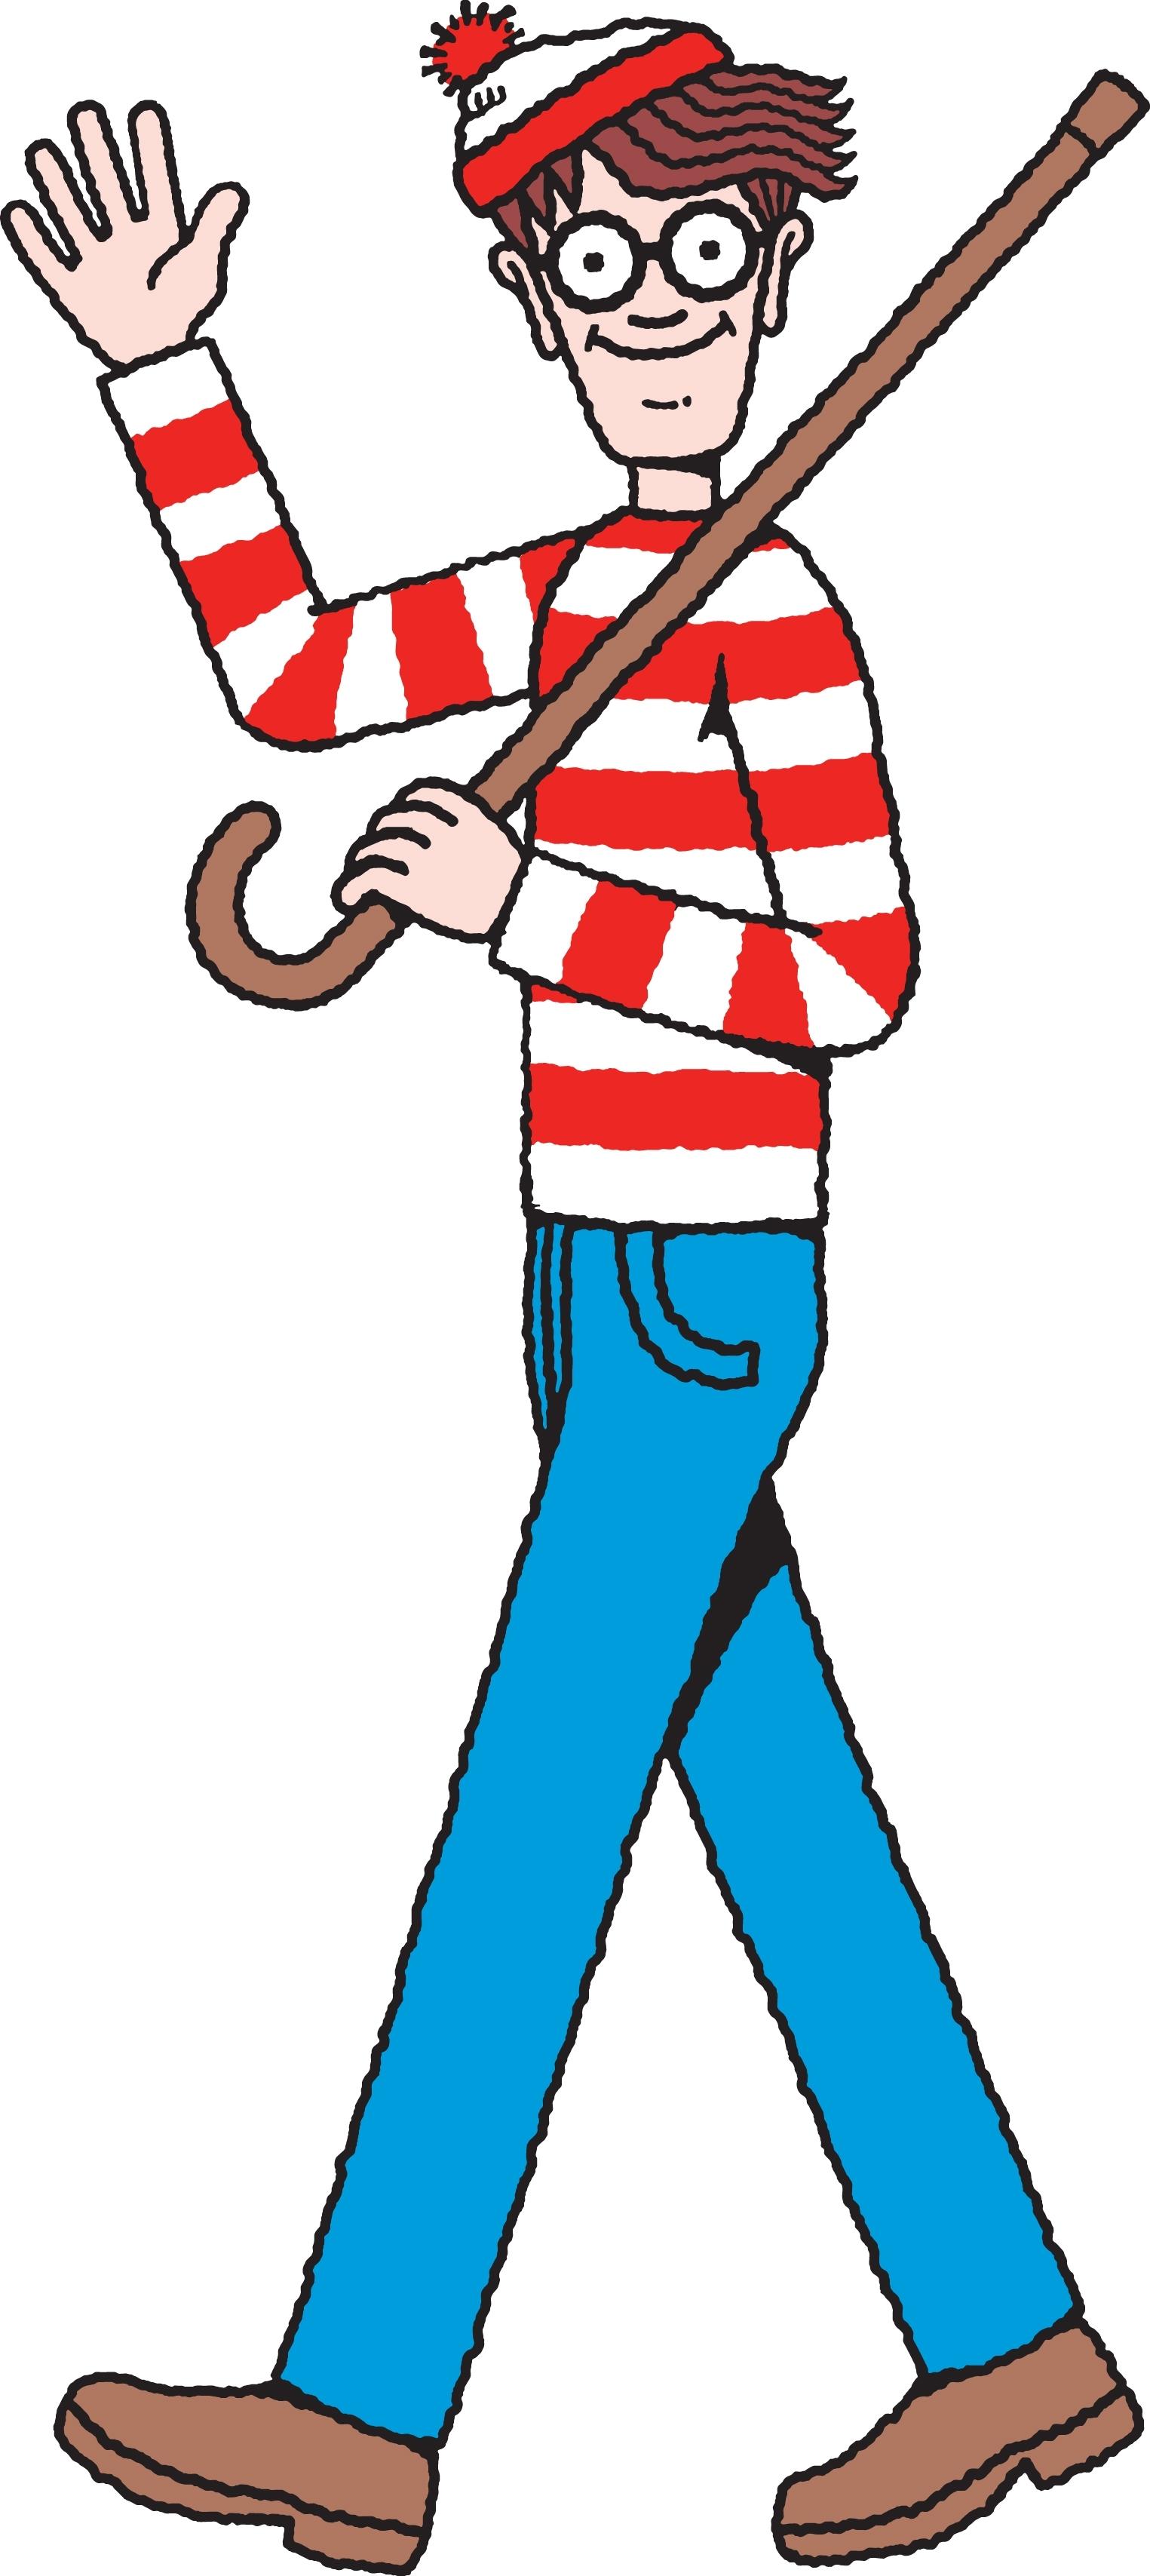 1525x3415 Where's Waldo Local 2014 Prince Books